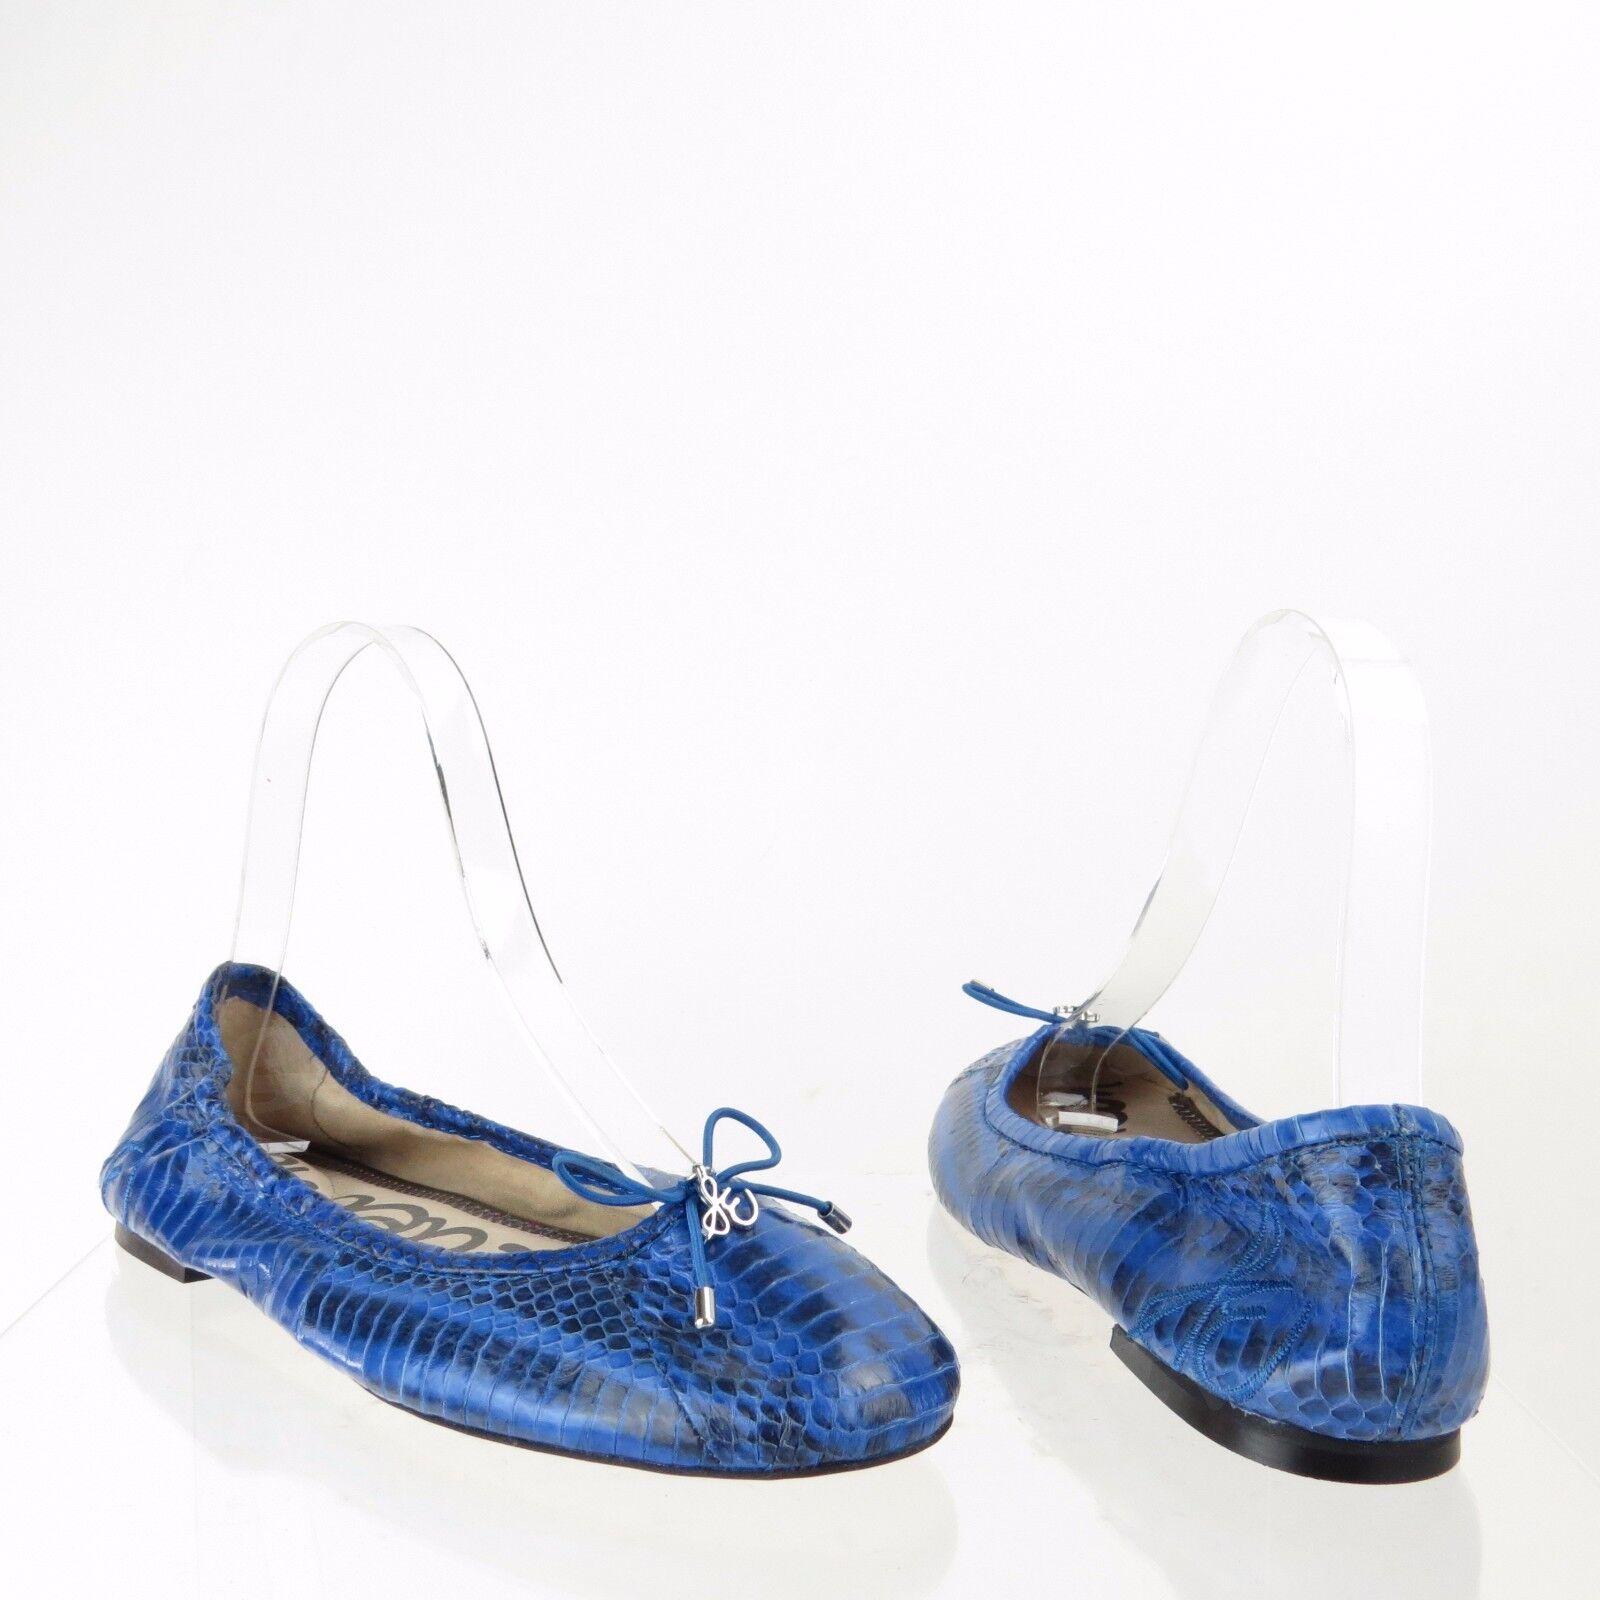 Sam Edelman Felicia Damenschuhe Schuhes Blau Leder Croc Print Ballet Flats Sz 6 M NEU